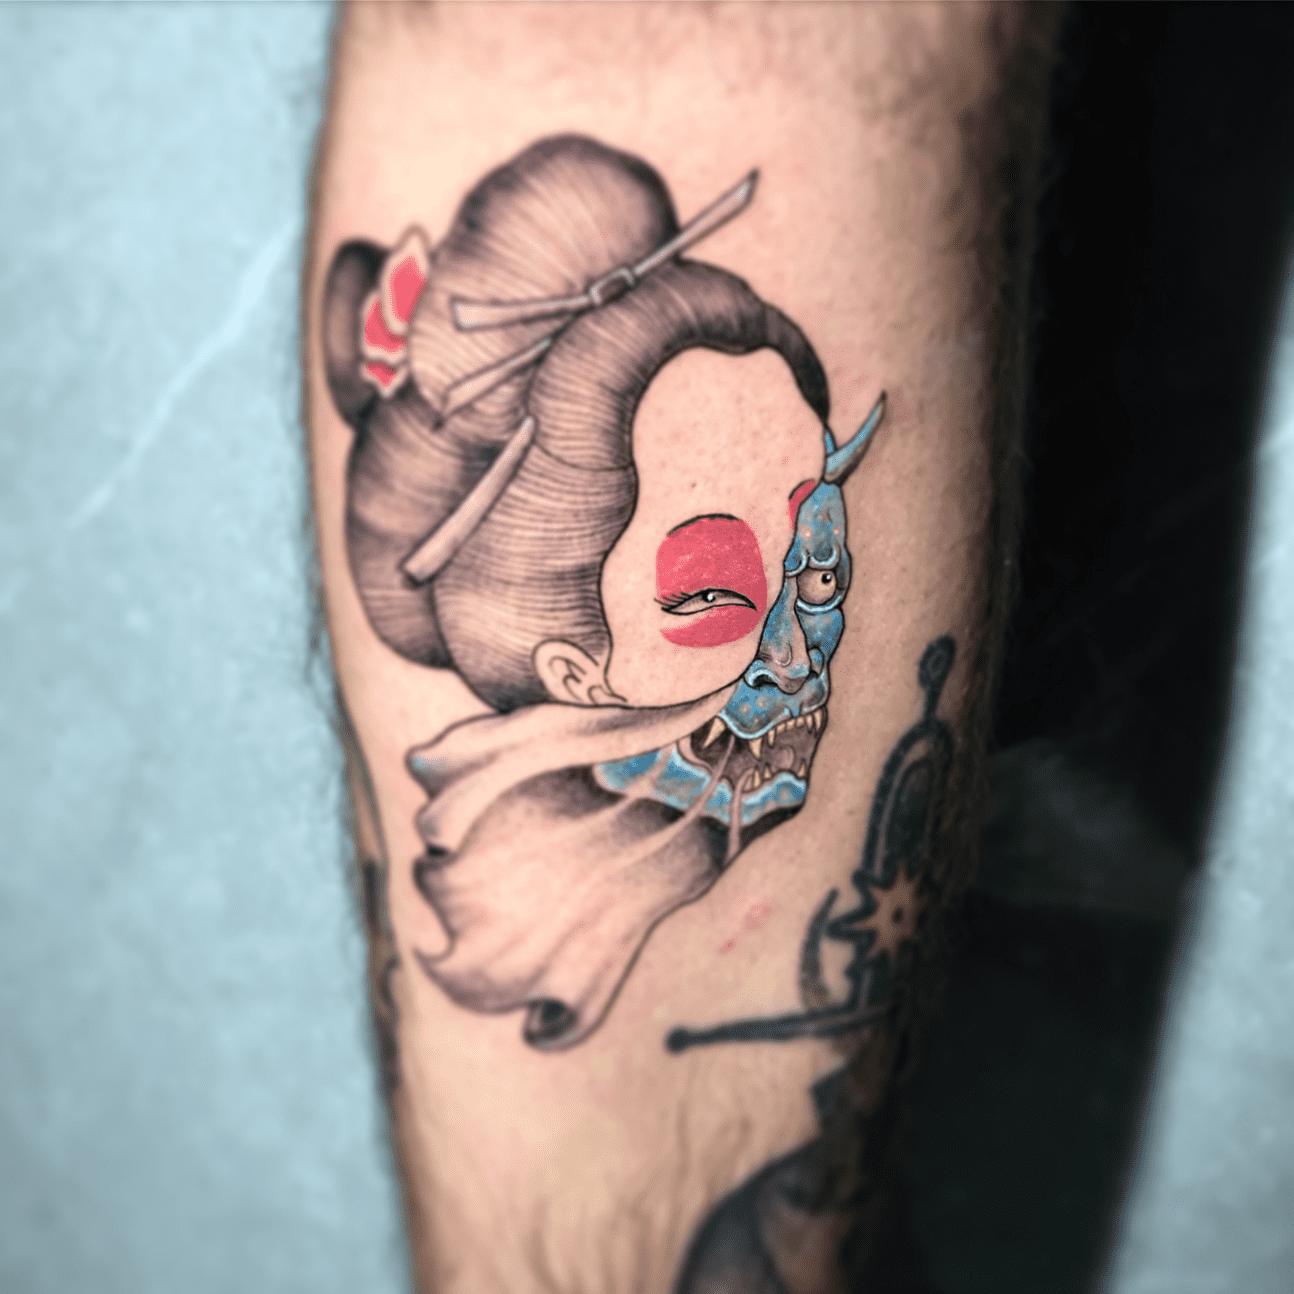 Tattoo giapponesi: la storia di hannya